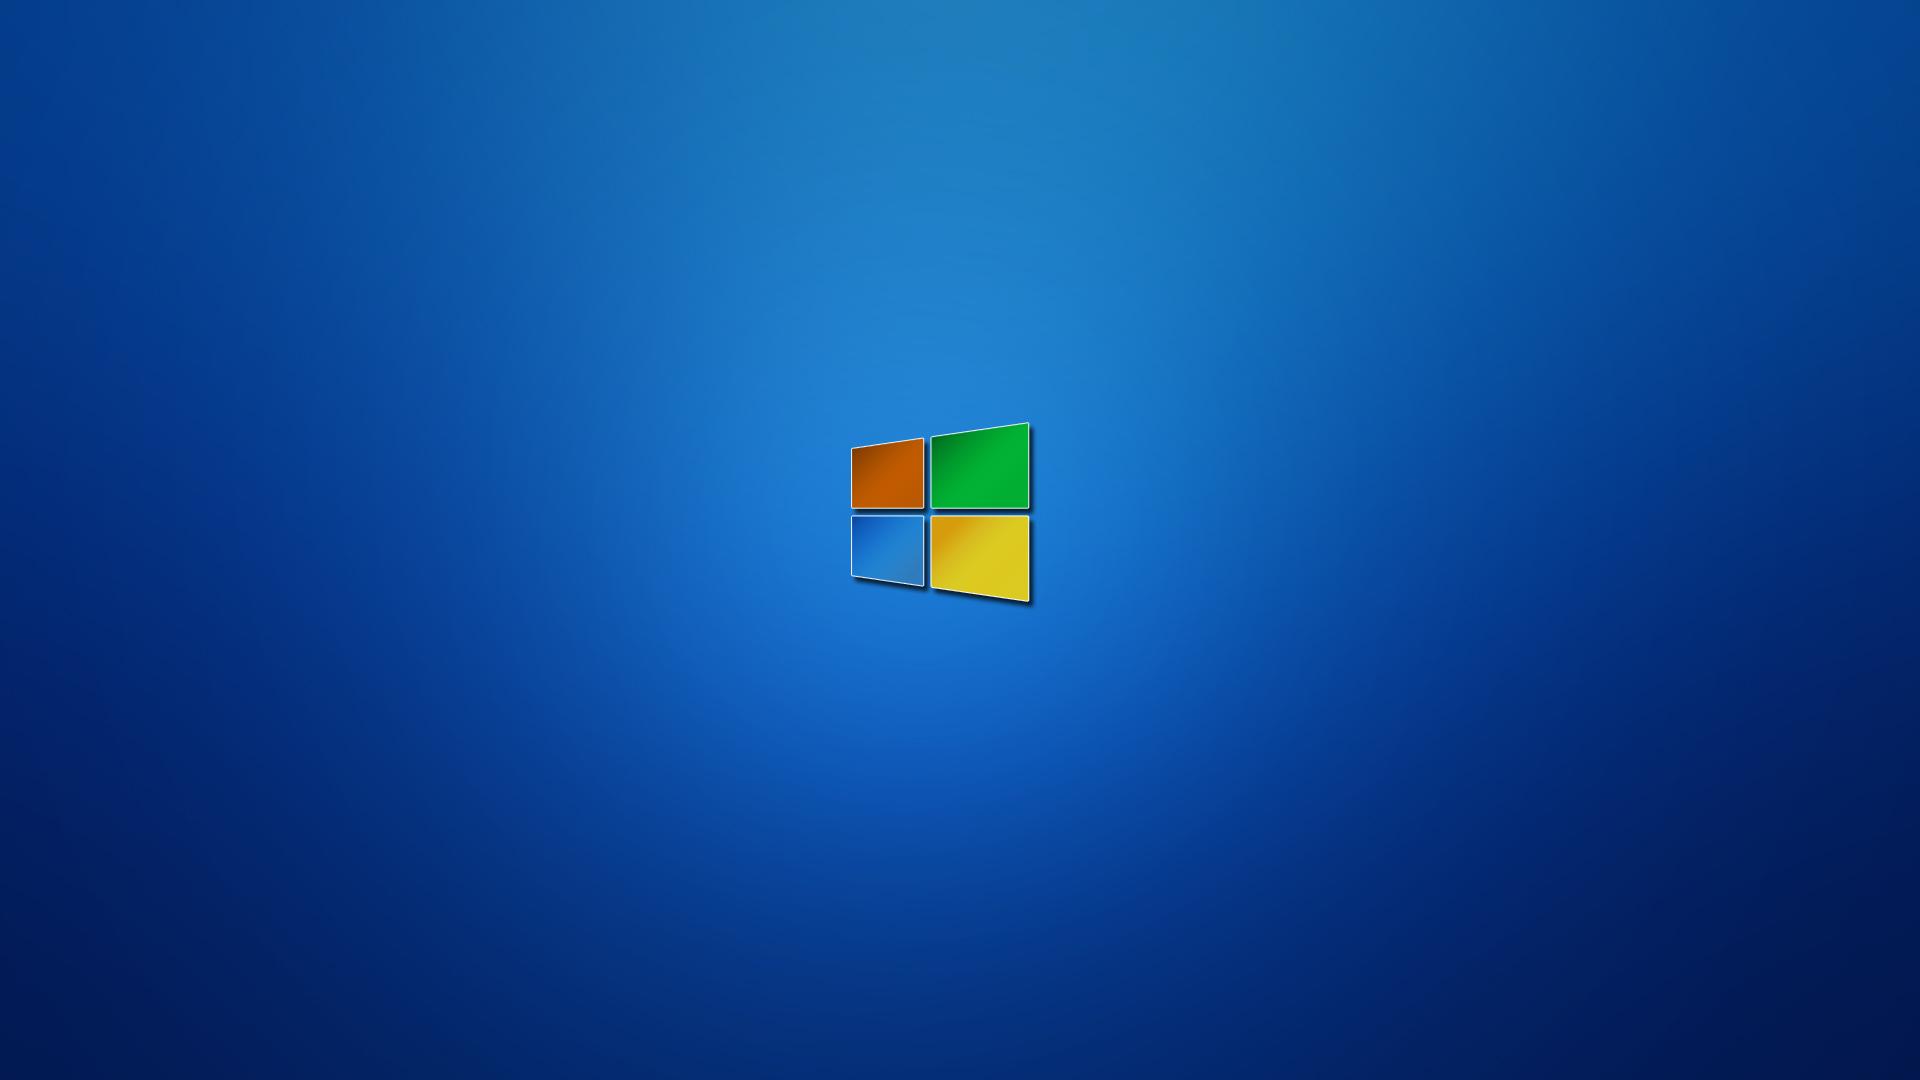 windows 8 wallpaper 2466